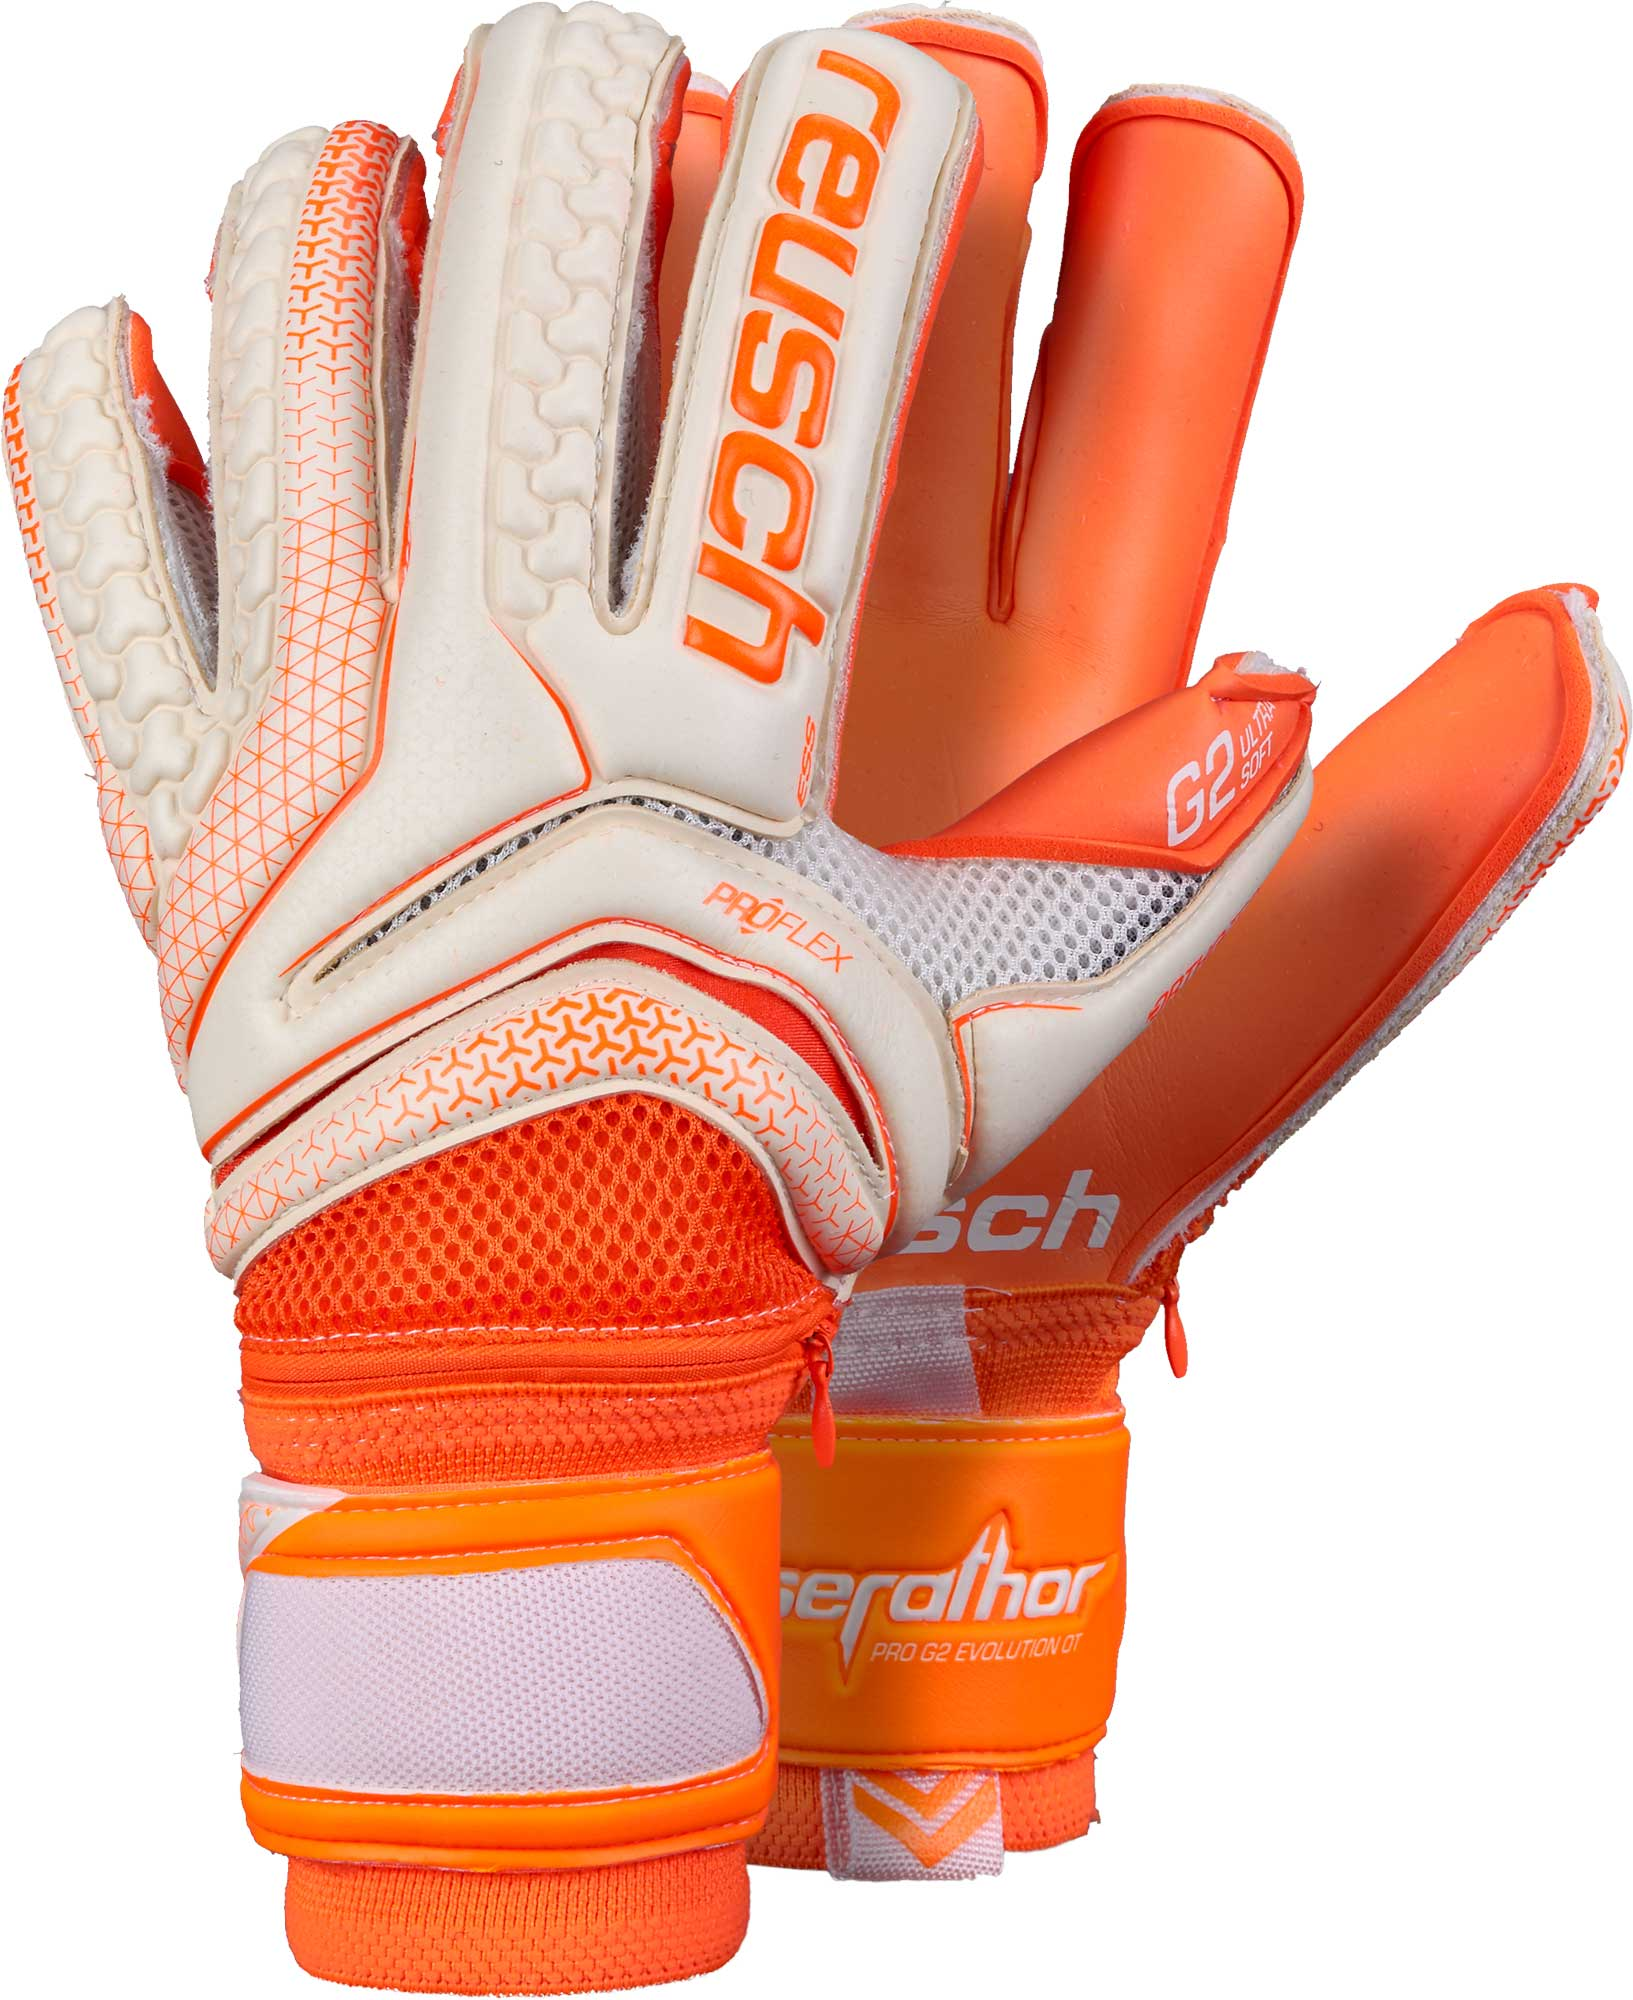 Reusch Serathor Pro G2 Evolution Ortho-Tec Goalkeeper Gloves –  White Shocking Orange 2a7dd4629